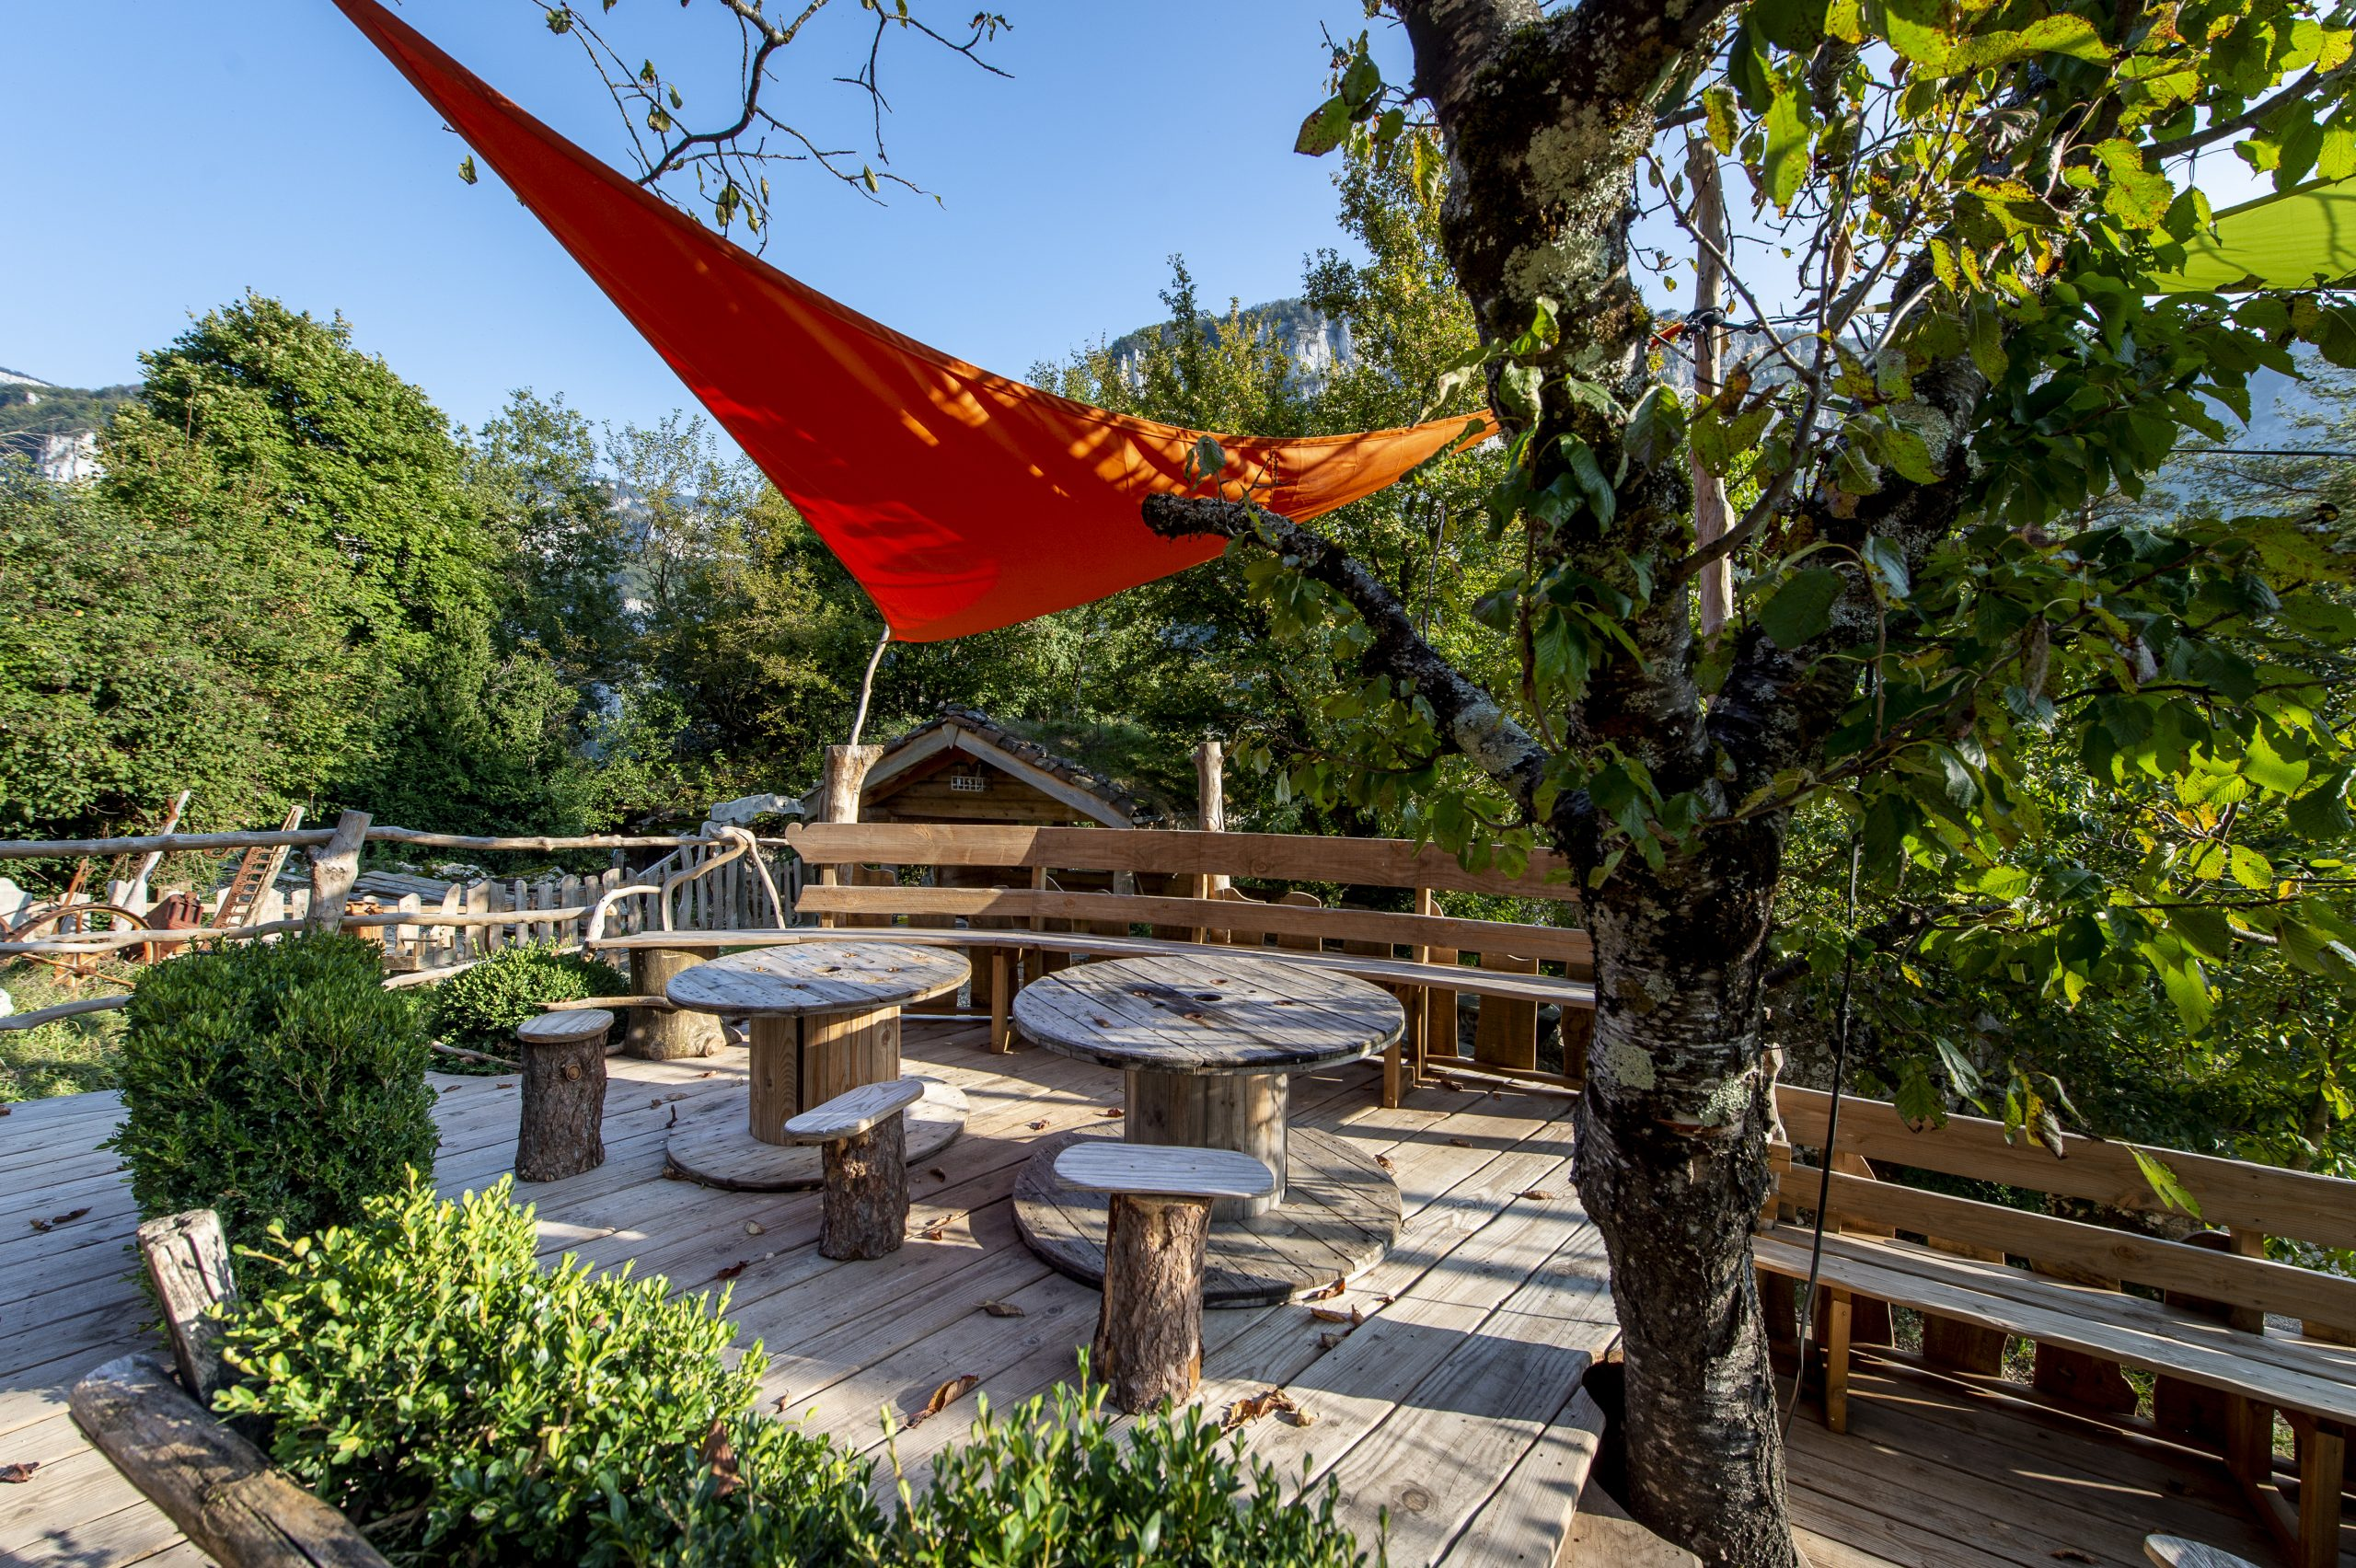 Cabane Café, terrasse restaurant outdoor vercors